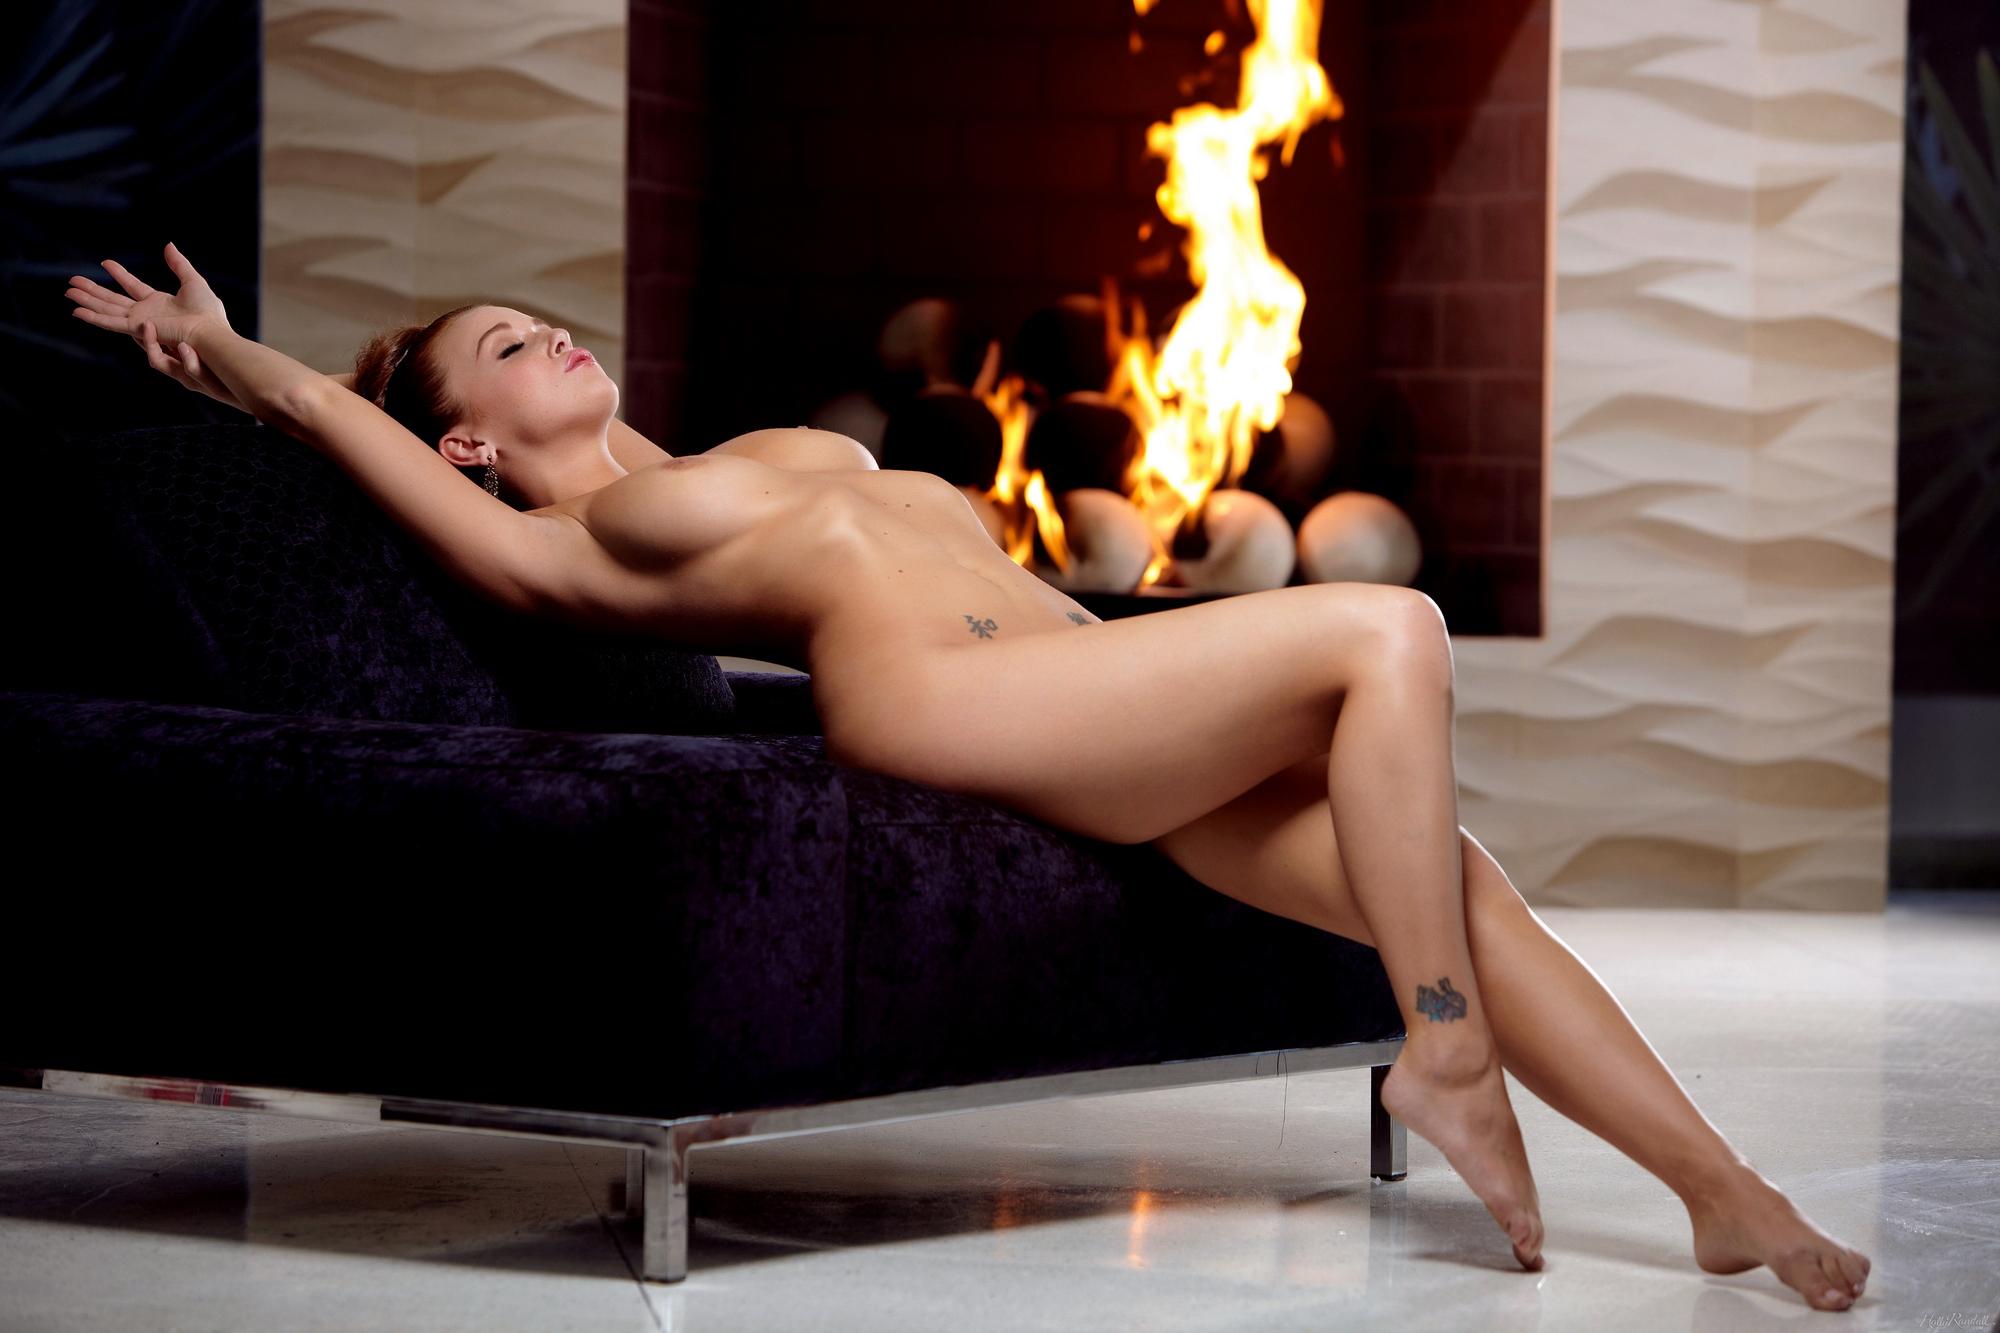 leanna-decker-nude-fireplace-redhead-hollyrandall-15